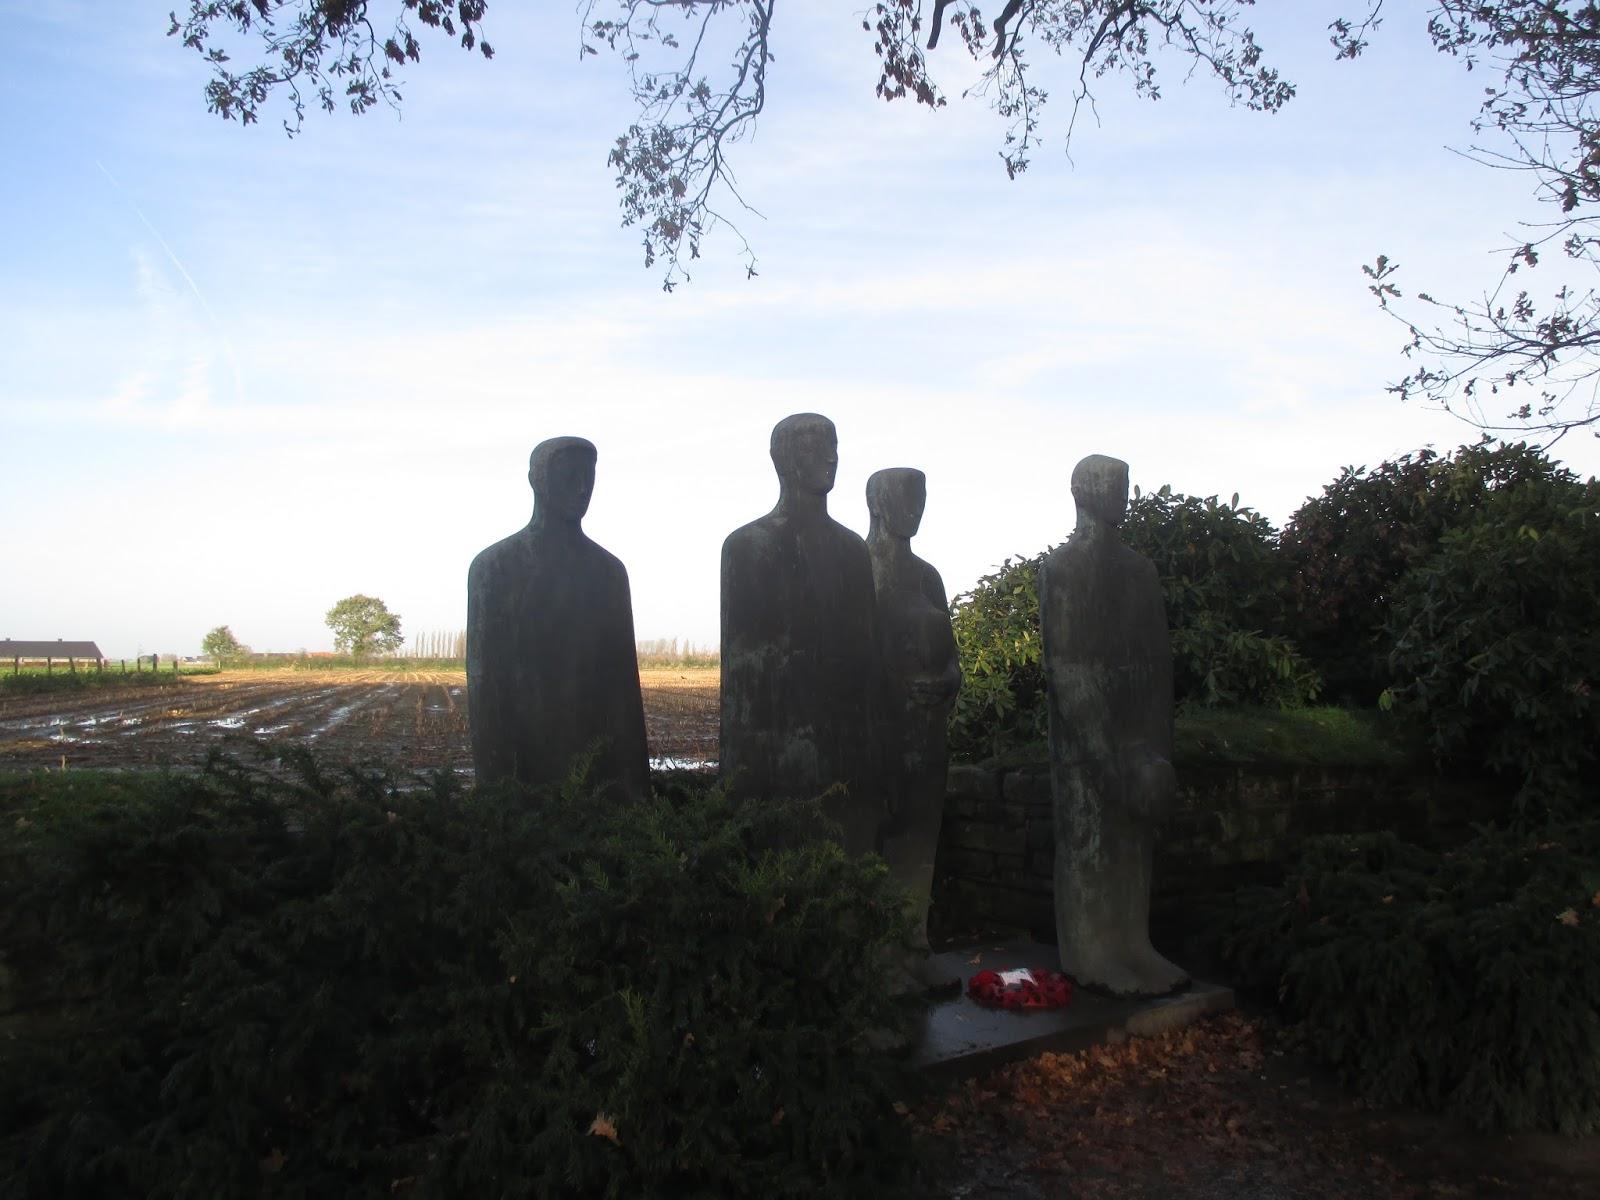 beeldengroep van Krieger